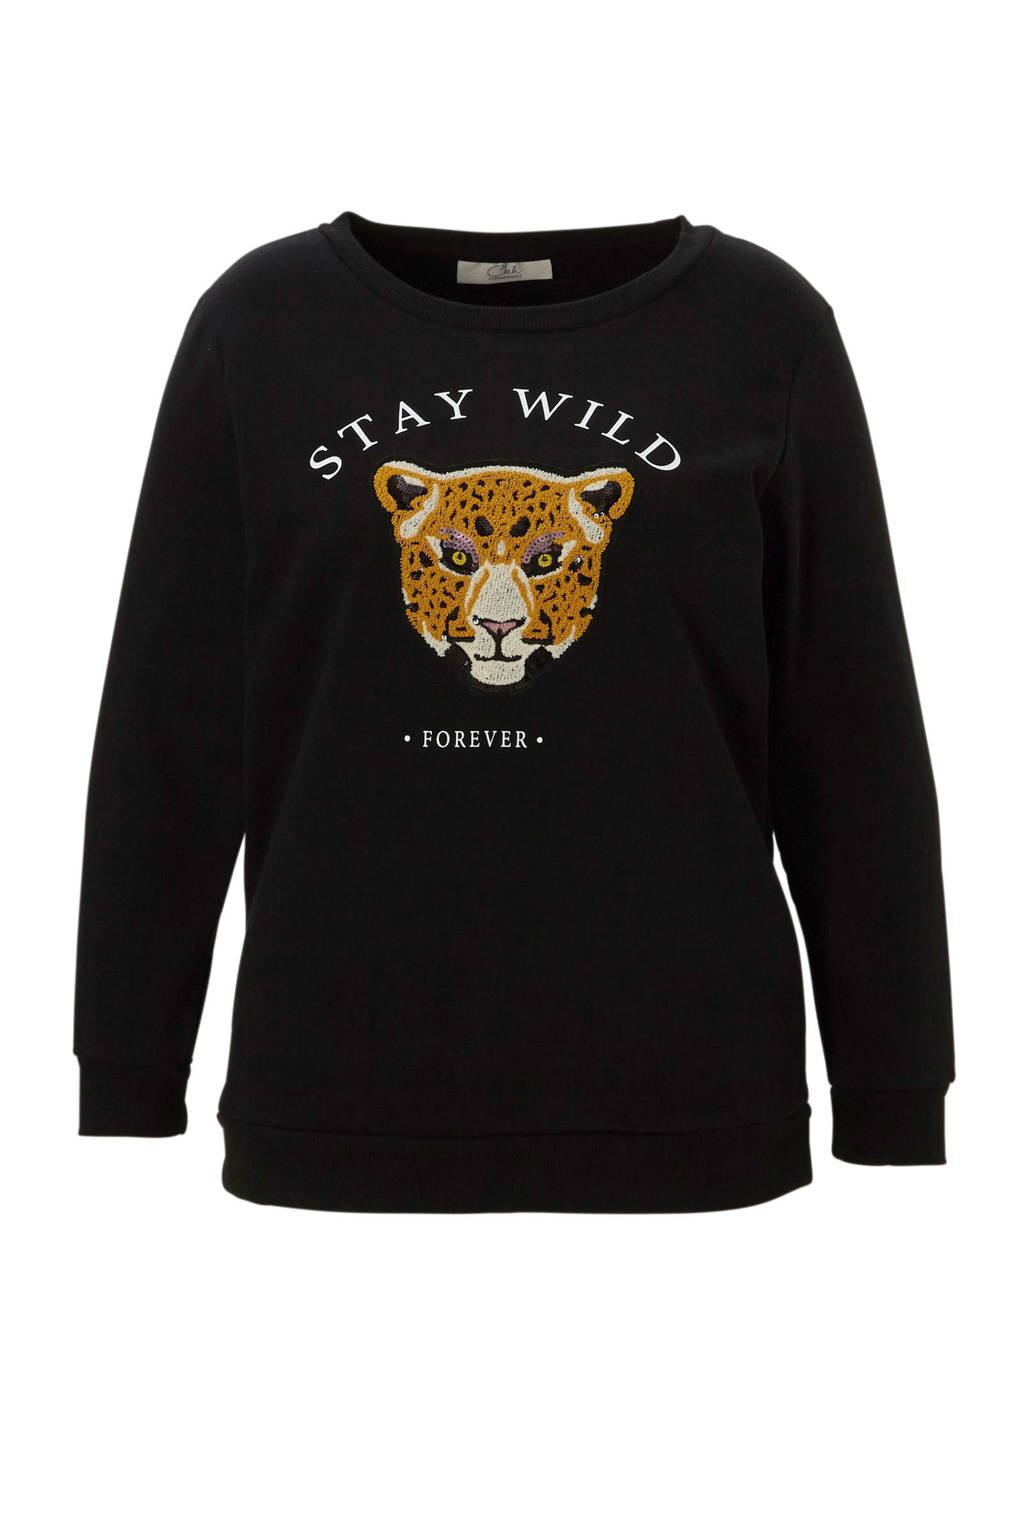 C&A XL Clockhouse sweater met tekstopdruk en borduursel zwart, Zwart/ Oker/ Beige/ Roze/ Wit